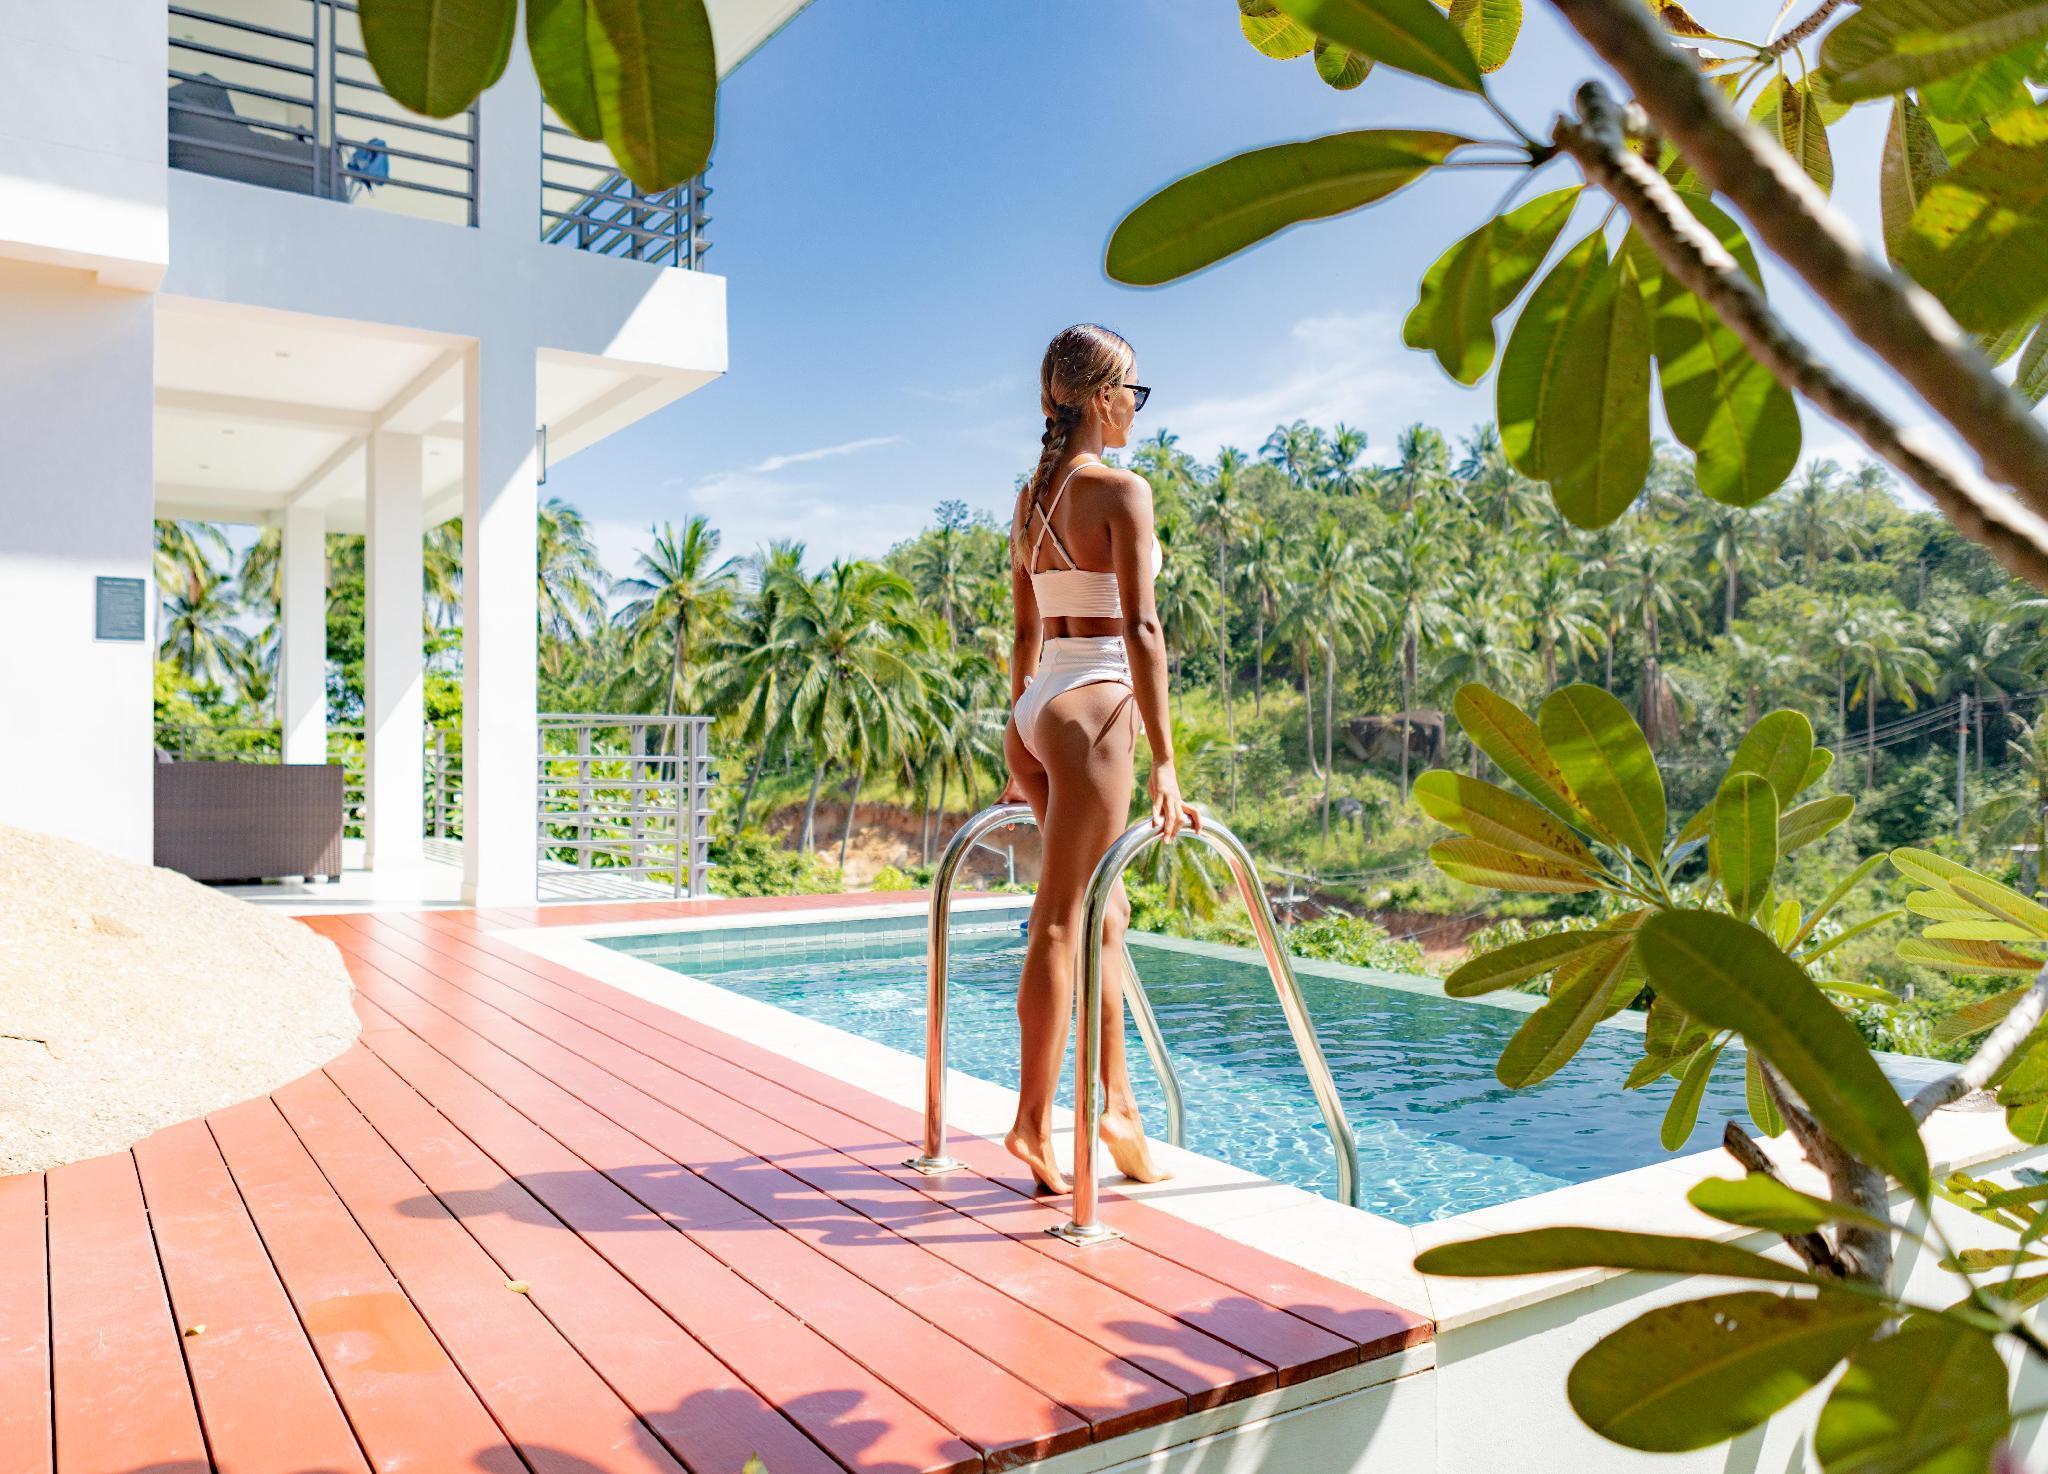 VILLA SABAAI | Sea View-Pool-Privacy-Service วิลลา 2 ห้องนอน 2 ห้องน้ำส่วนตัว ขนาด 140 ตร.ม. – หาดละไม